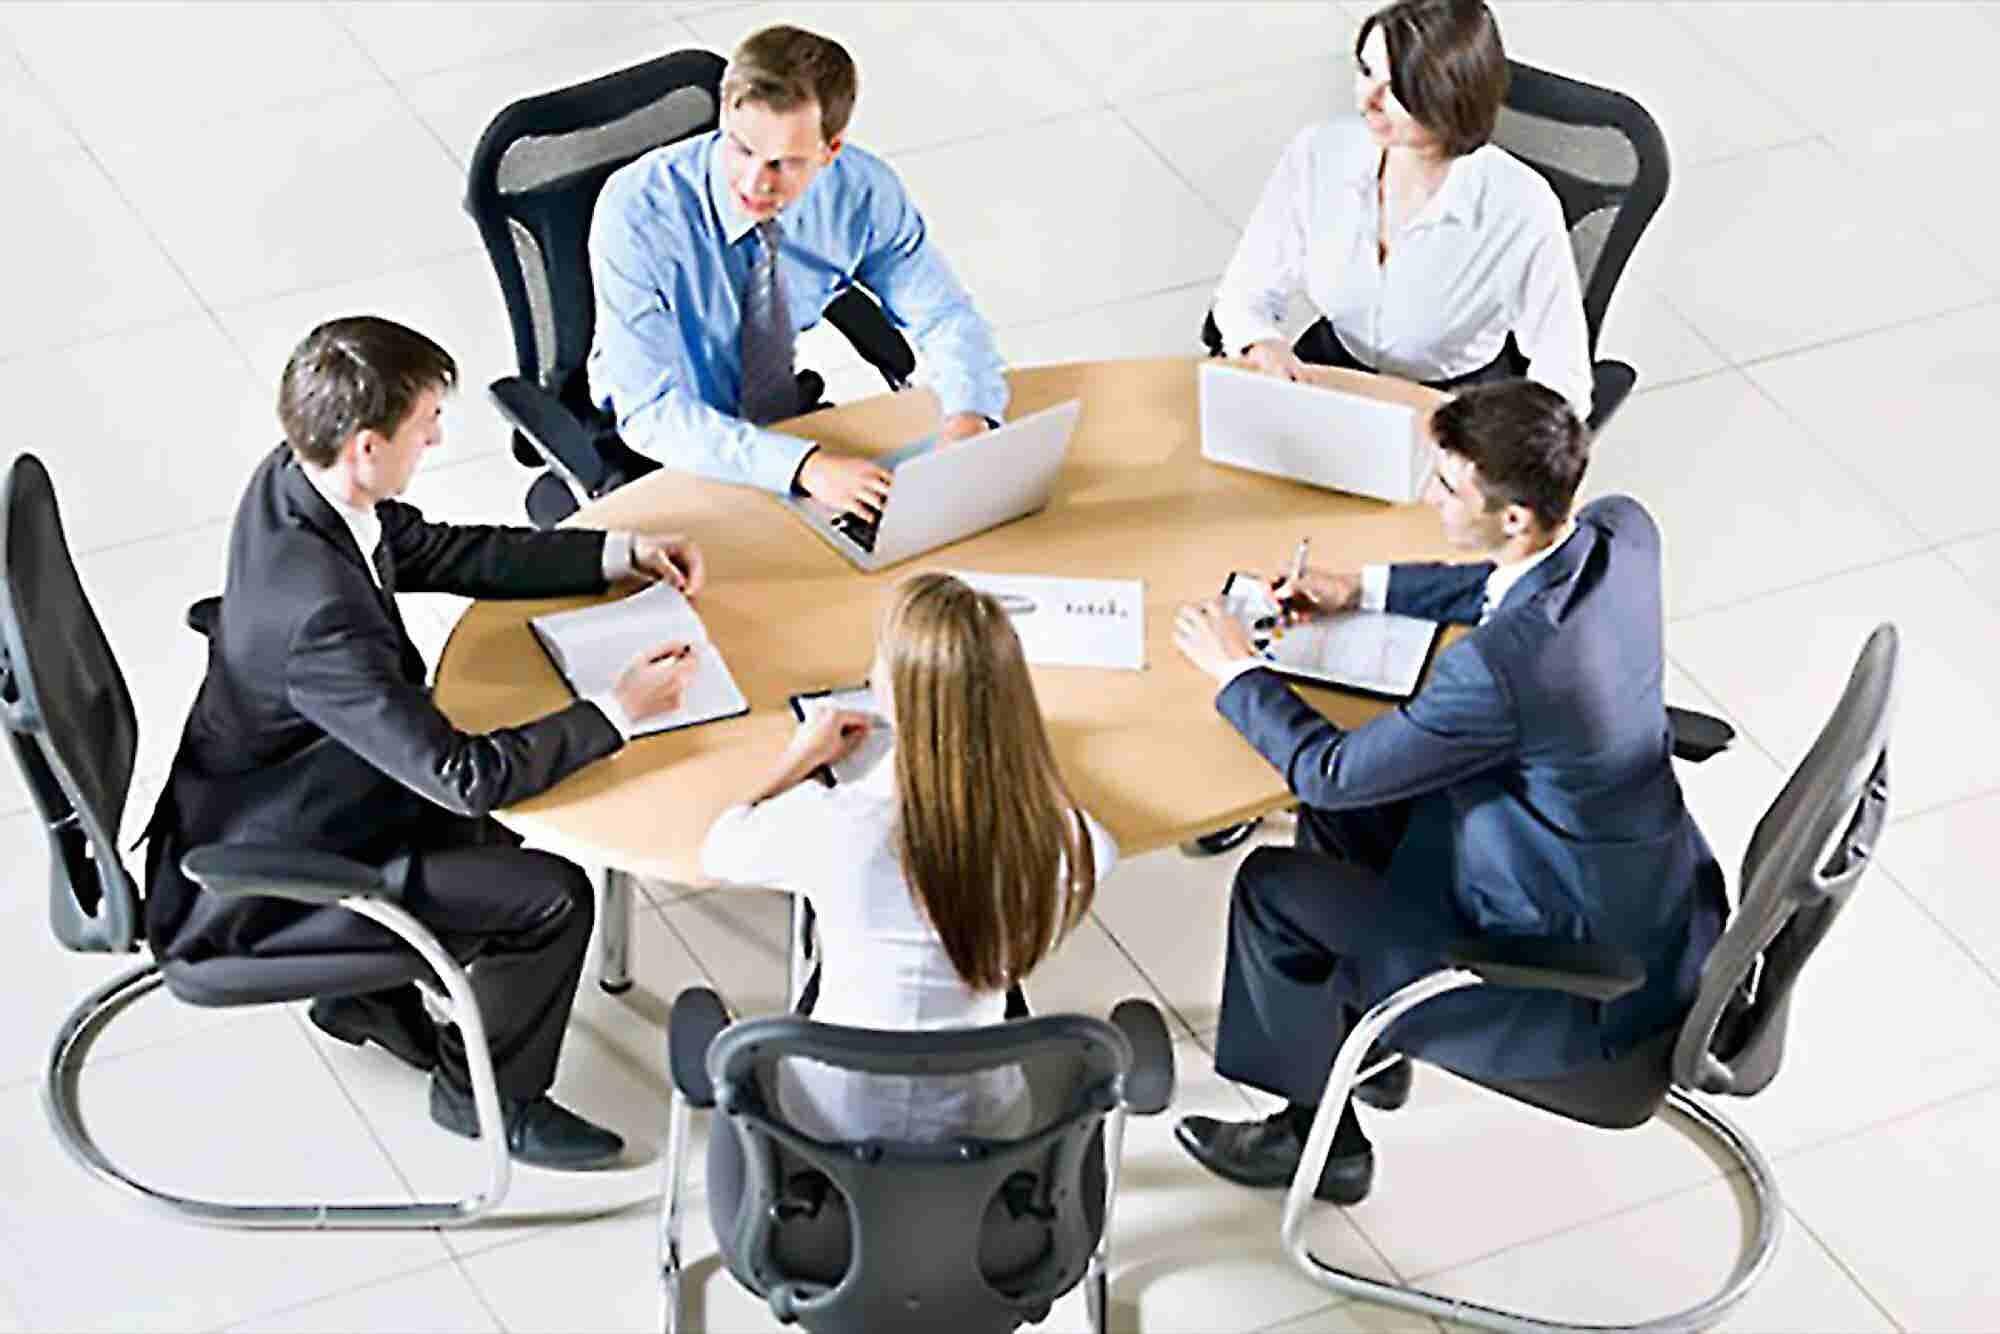 Advisory Board 101: Dear Advisors, Please Don't Do This